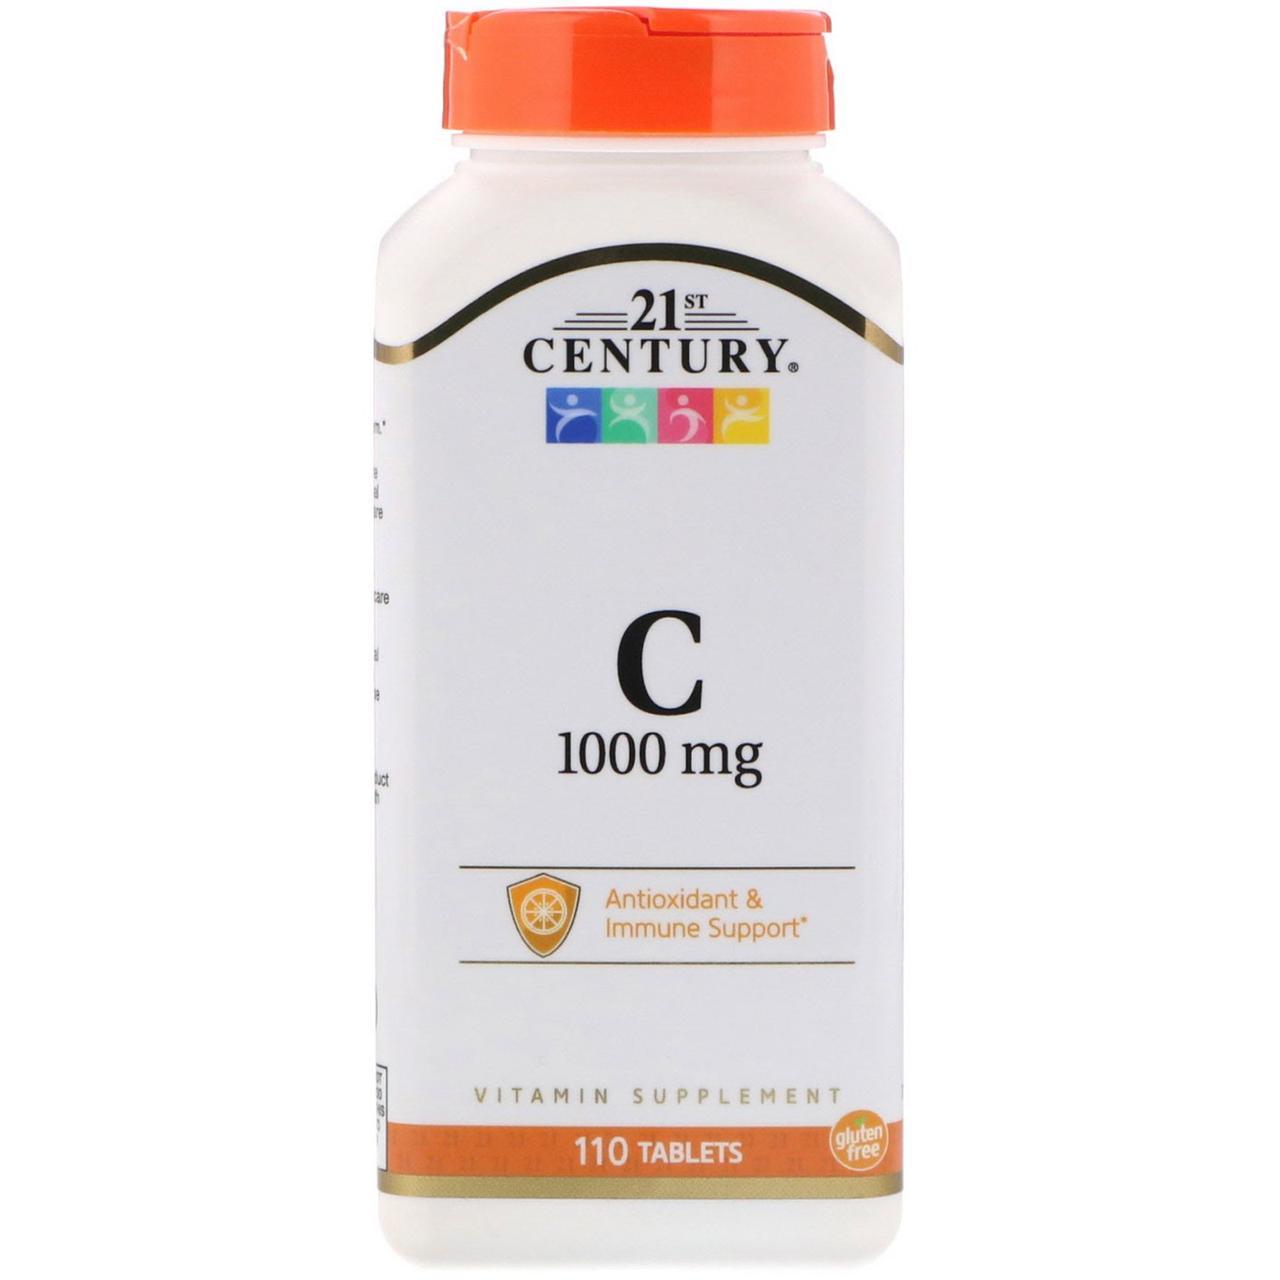 Вітамін С, 21st Century Health Care, 1000, 110 таблеток